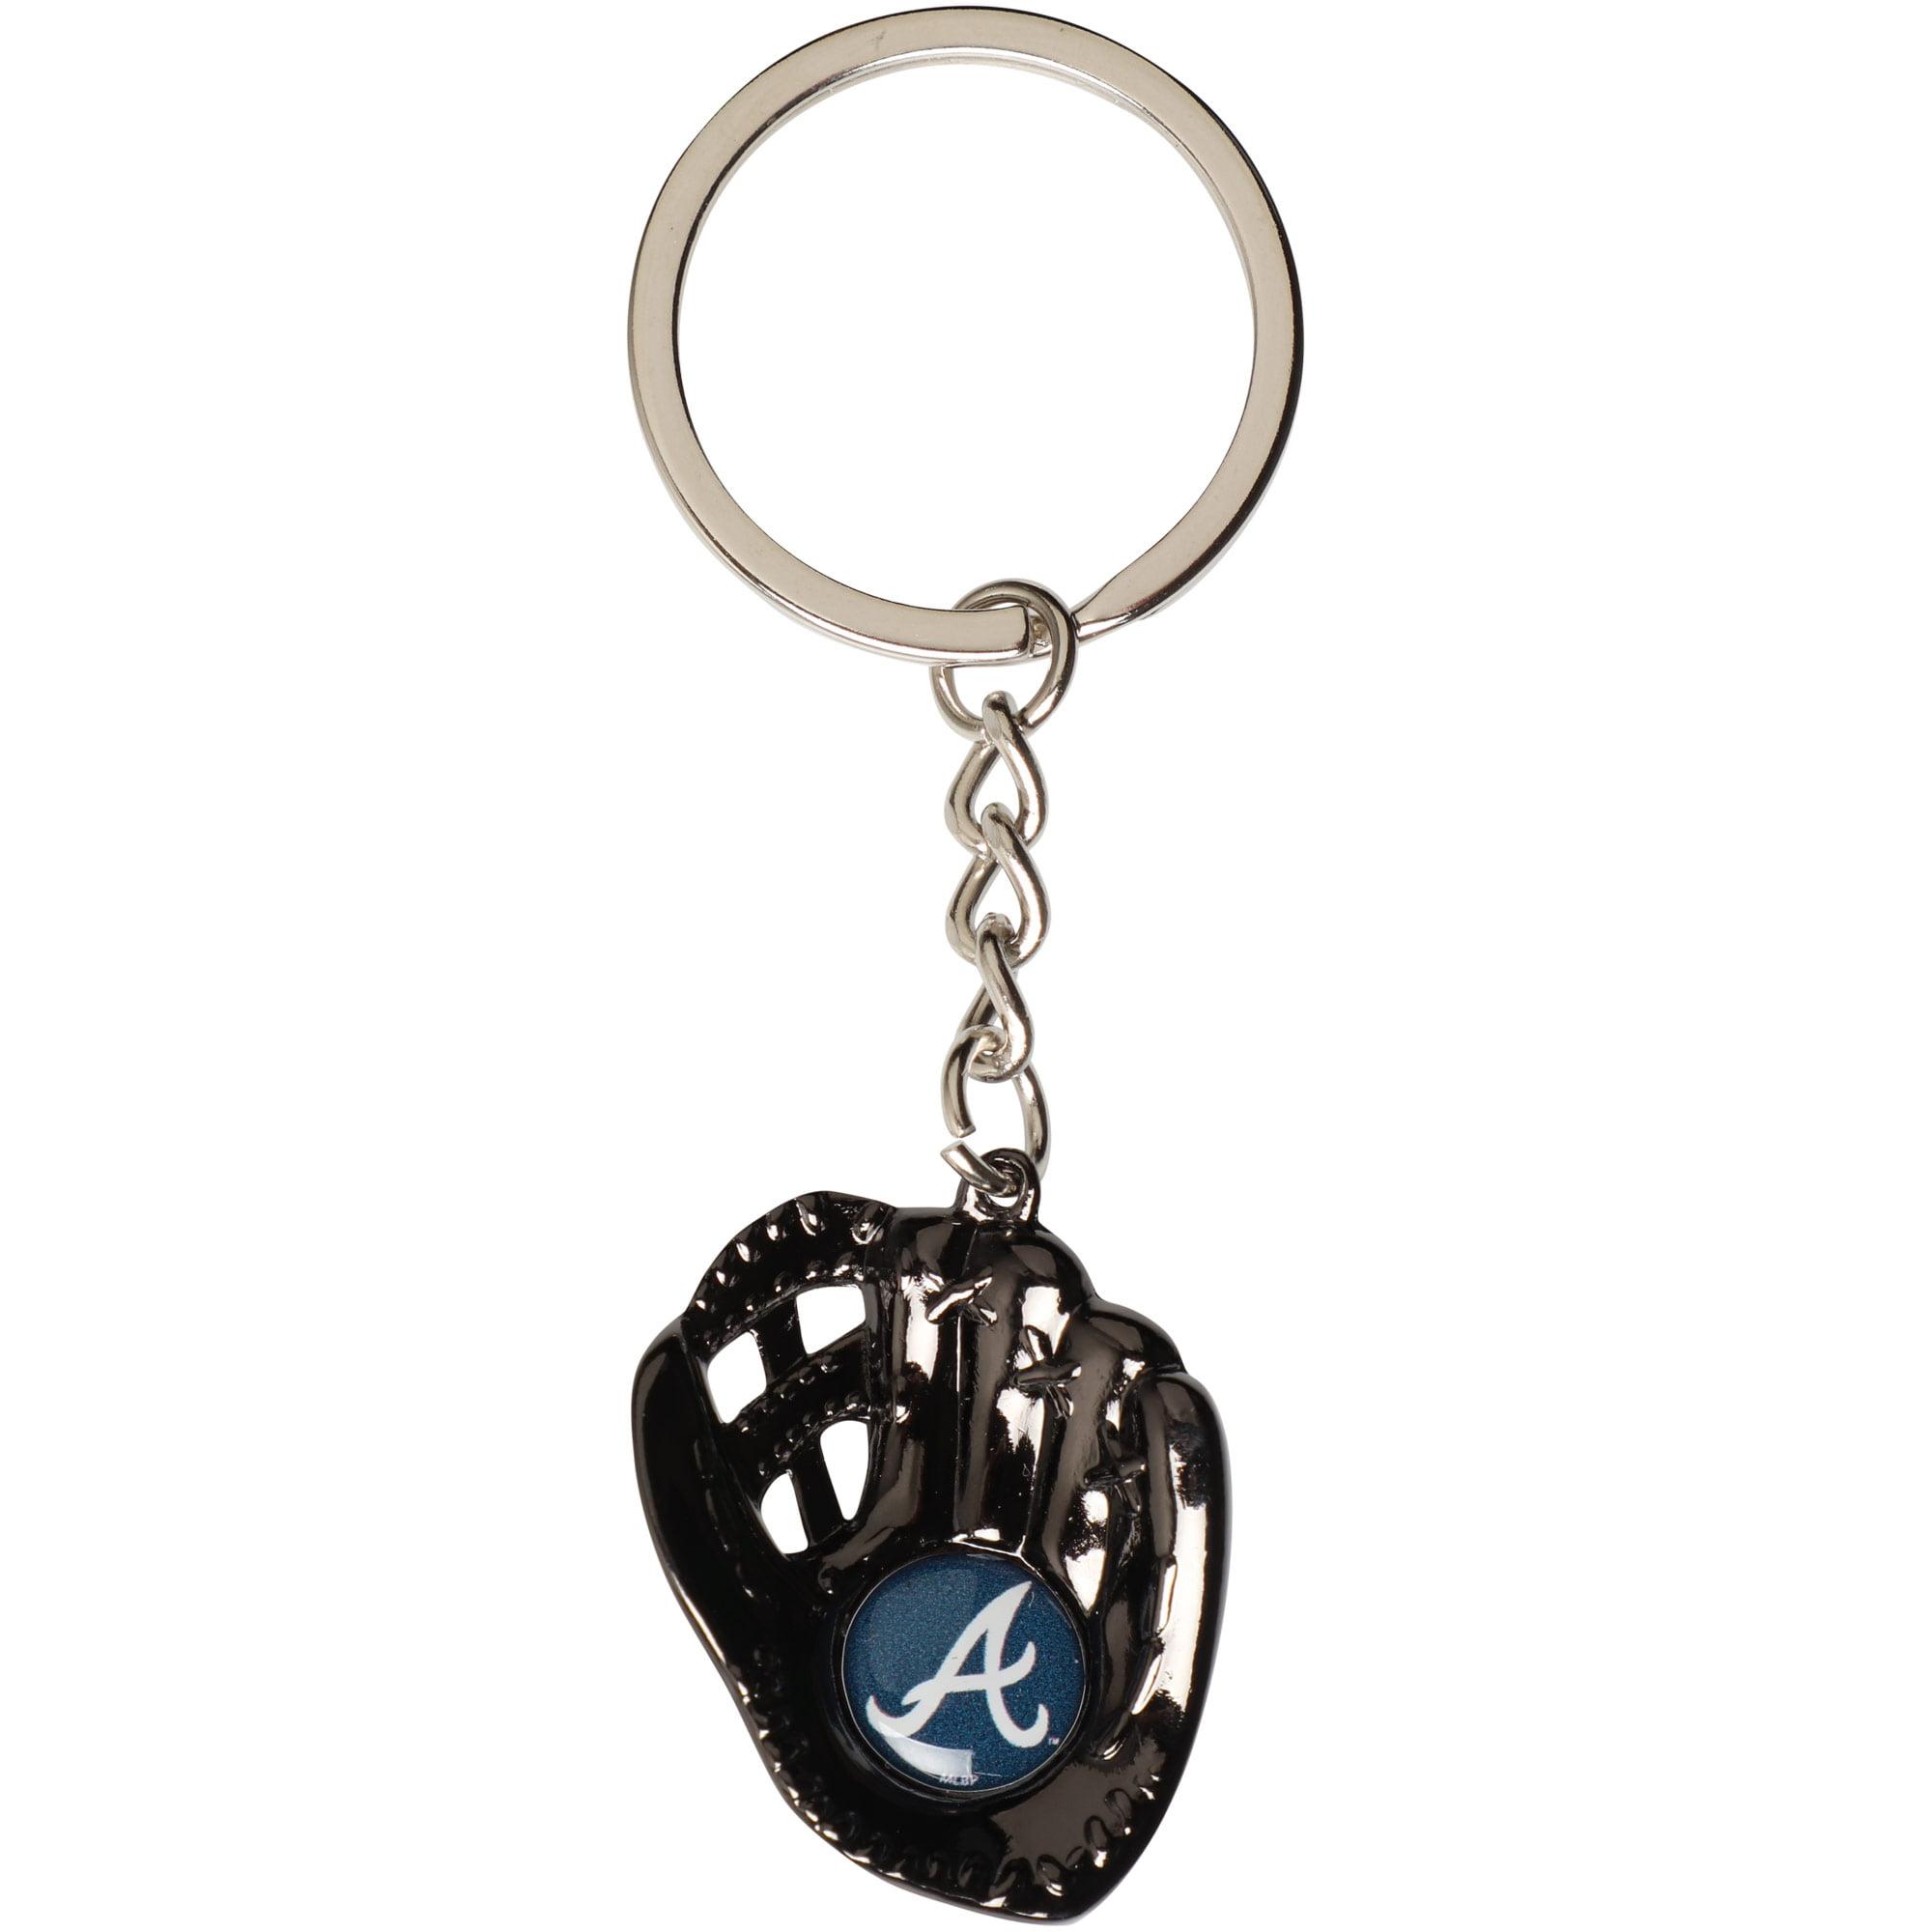 Atlanta Braves Baseball Glove Team Keychain - No Size